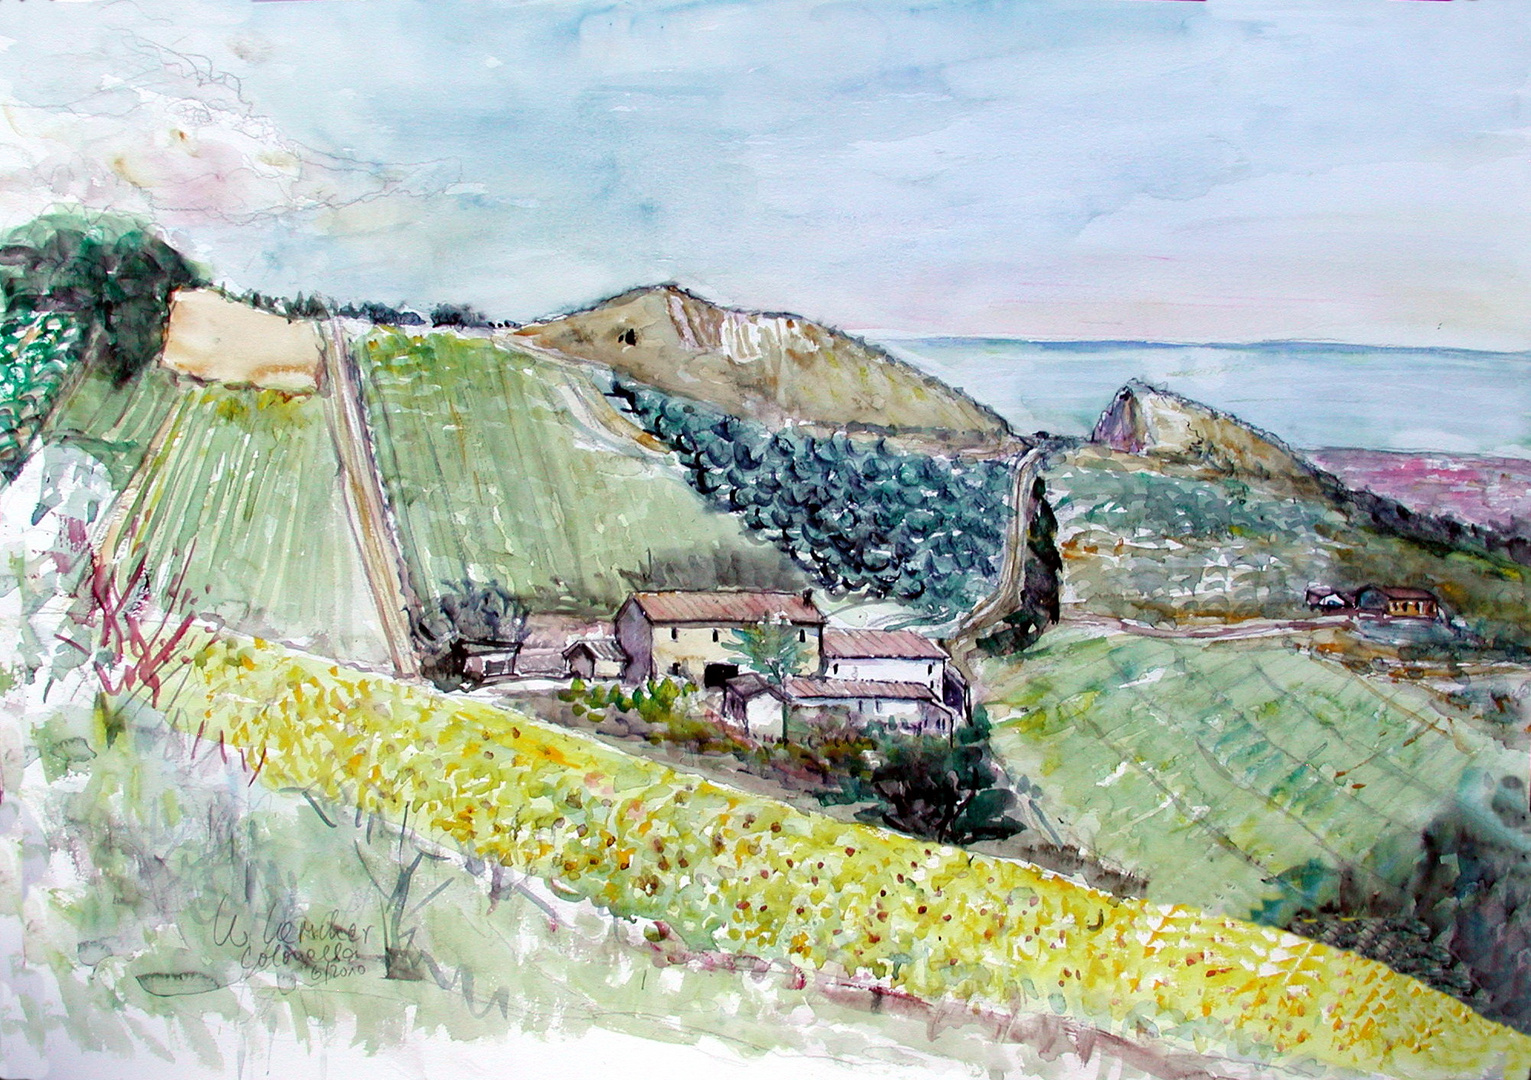 Landschaft bei Colonnella - Abruzzen